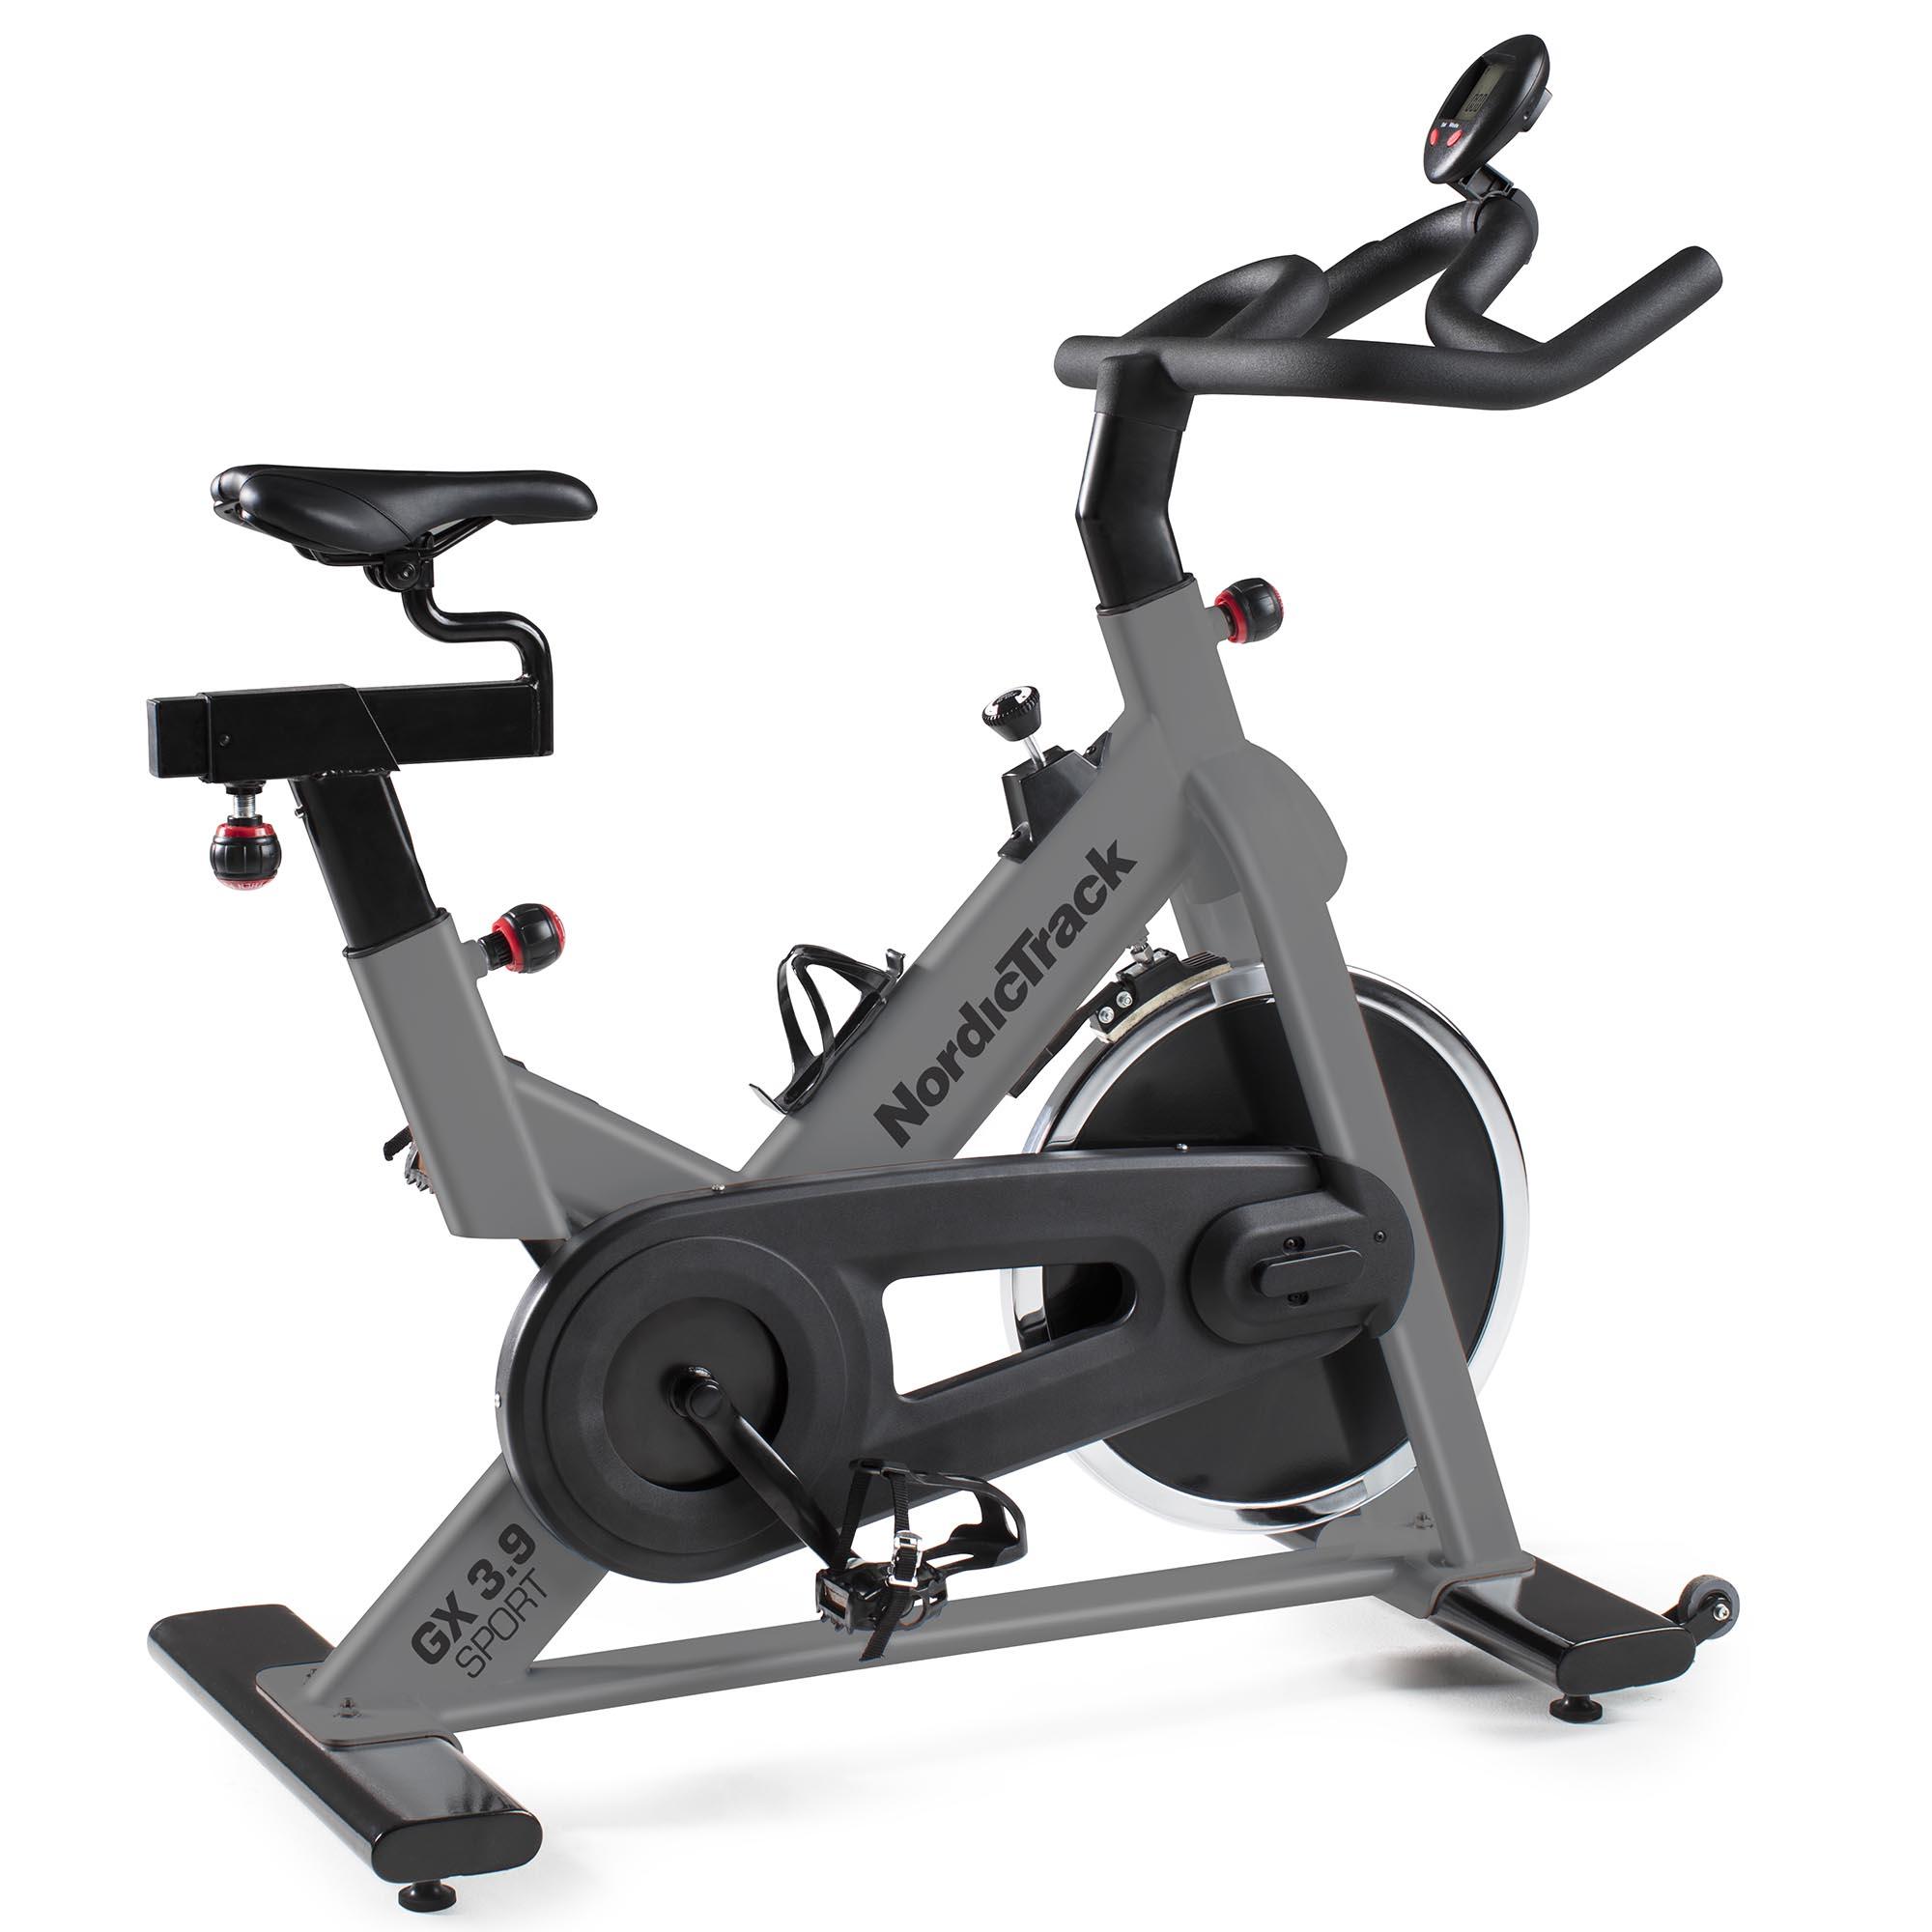 NordicTrack GX 3.9 Sport Indoor Cycle